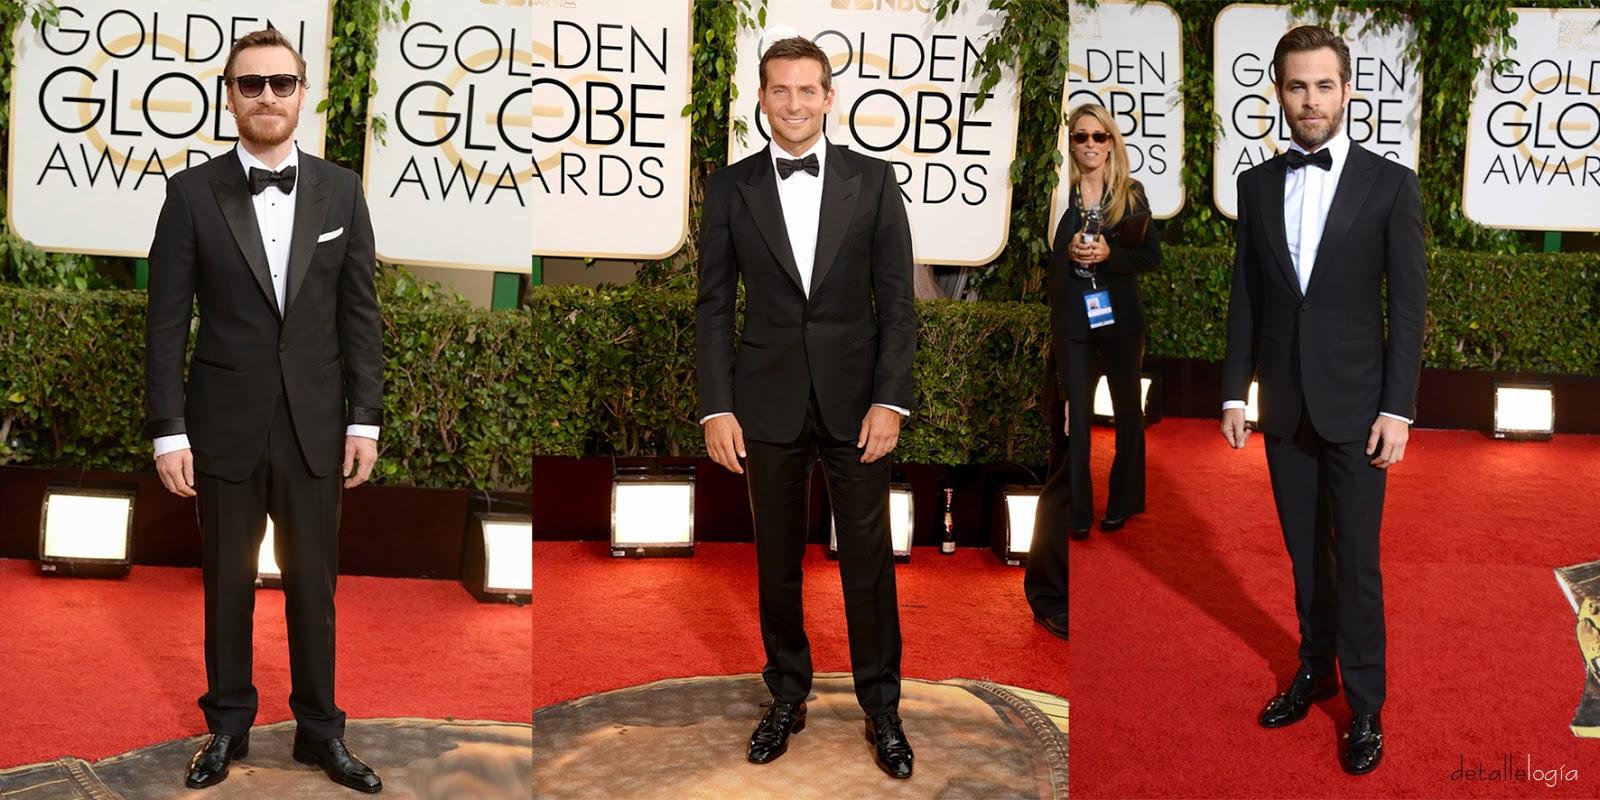 Los Golden Globe De Chicos 2014 Awards Detallelogia zAwPgqA